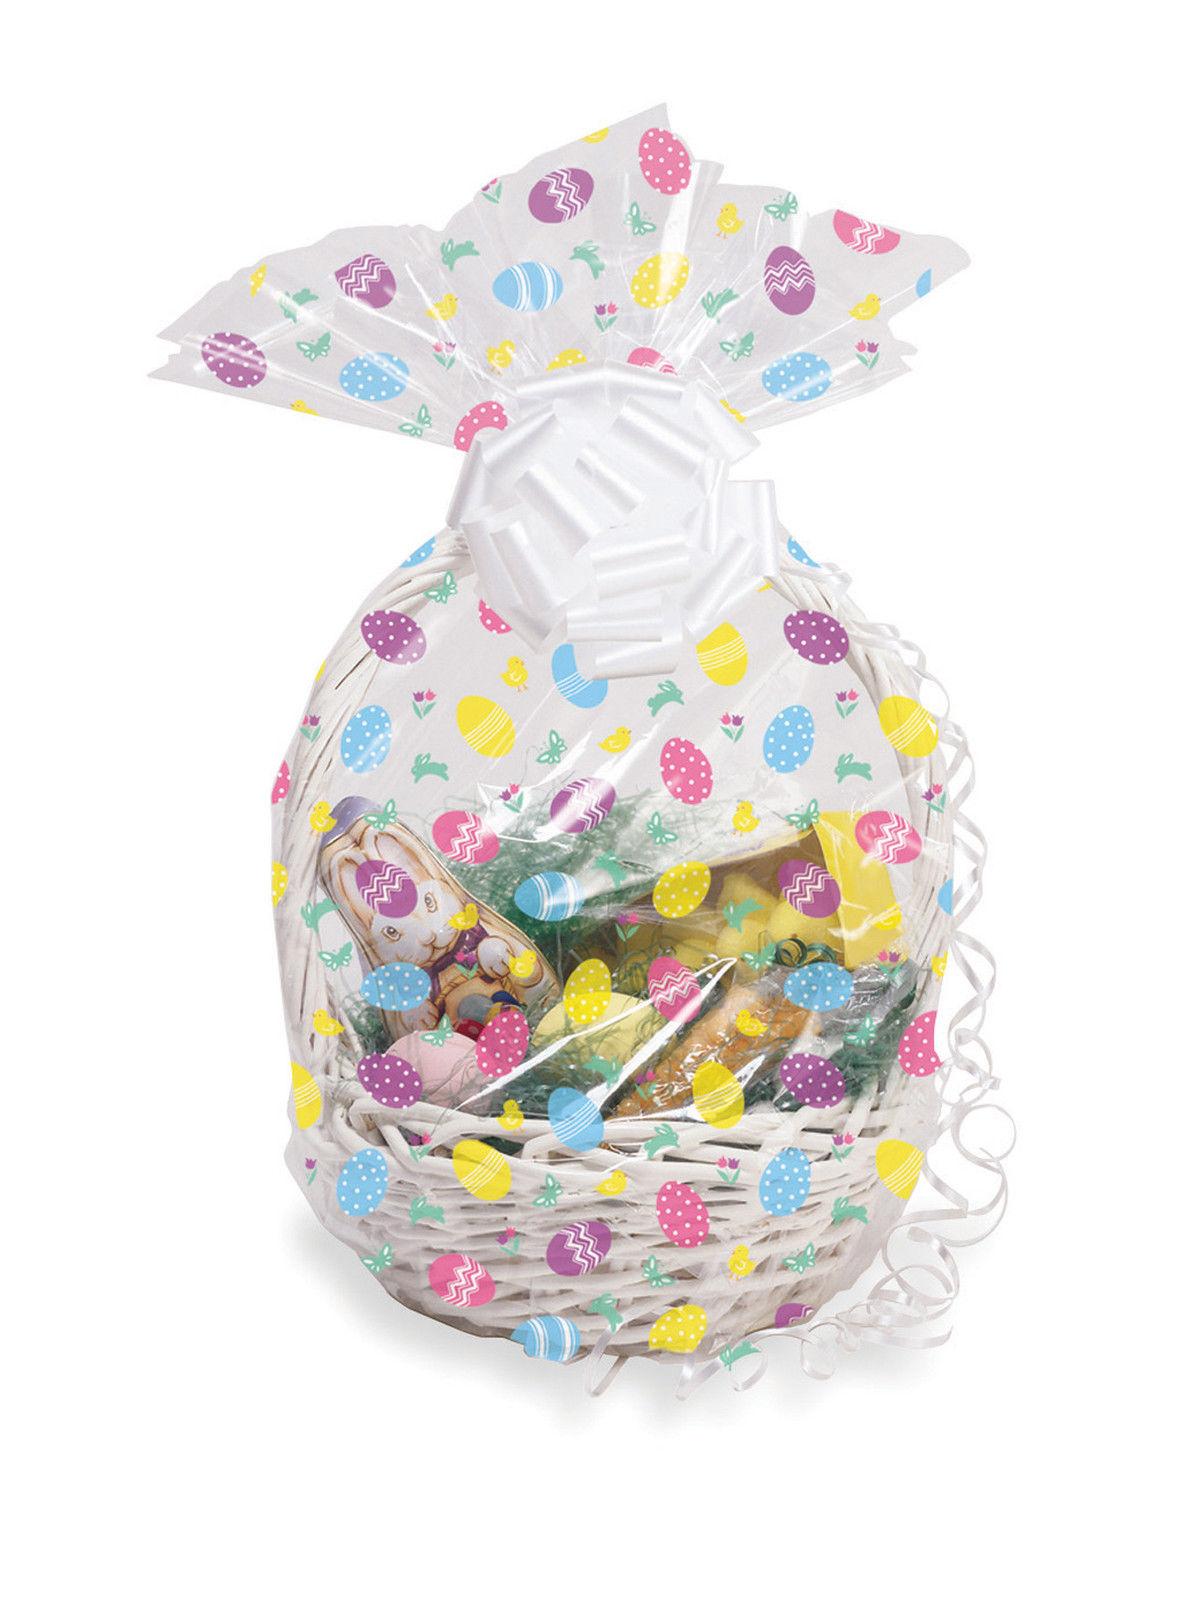 Easter eggs hamper wrap cellophane basket gift wrap large cello easter eggs hamper wrap cellophane basket gift wrap large cello basket bag negle Choice Image